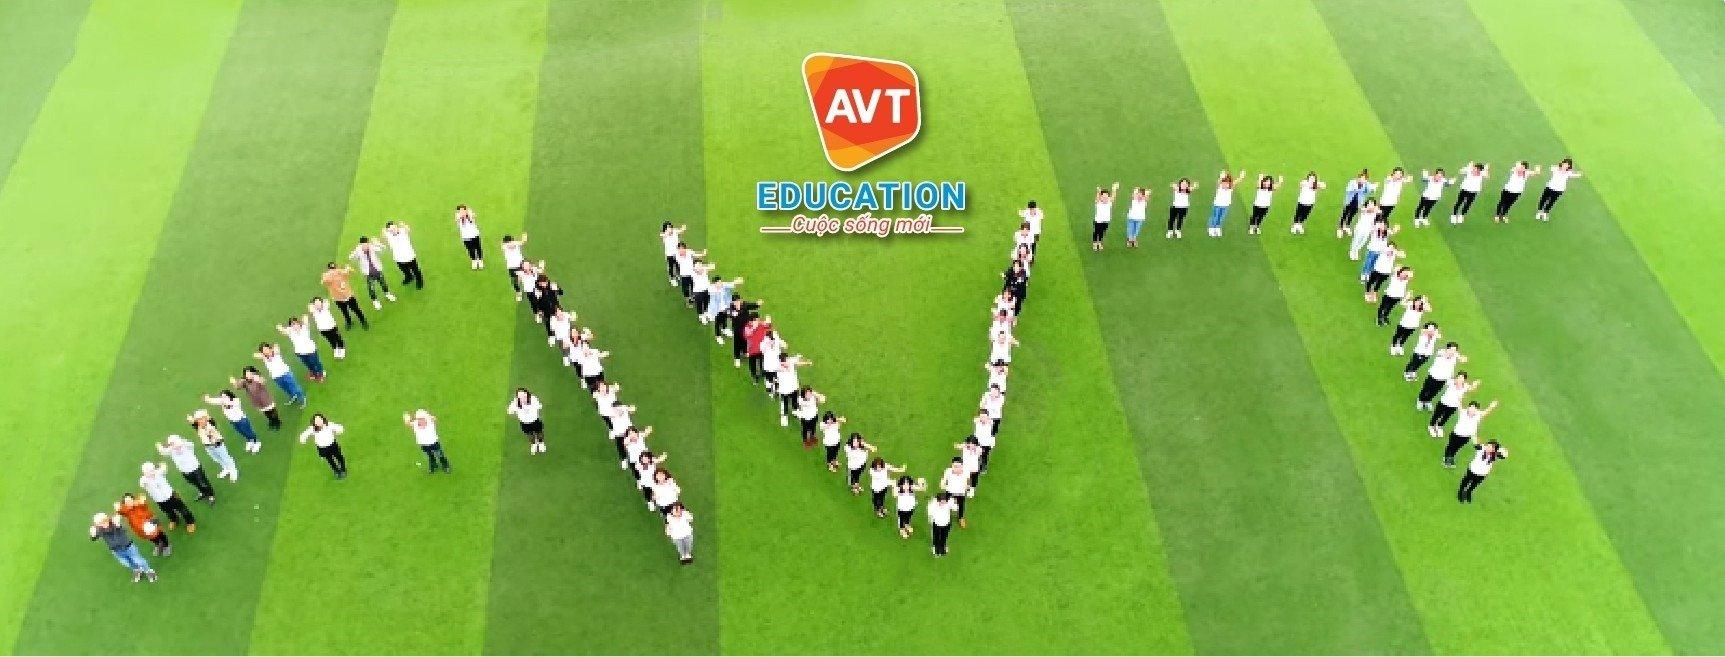 AVT education tuyển dụng